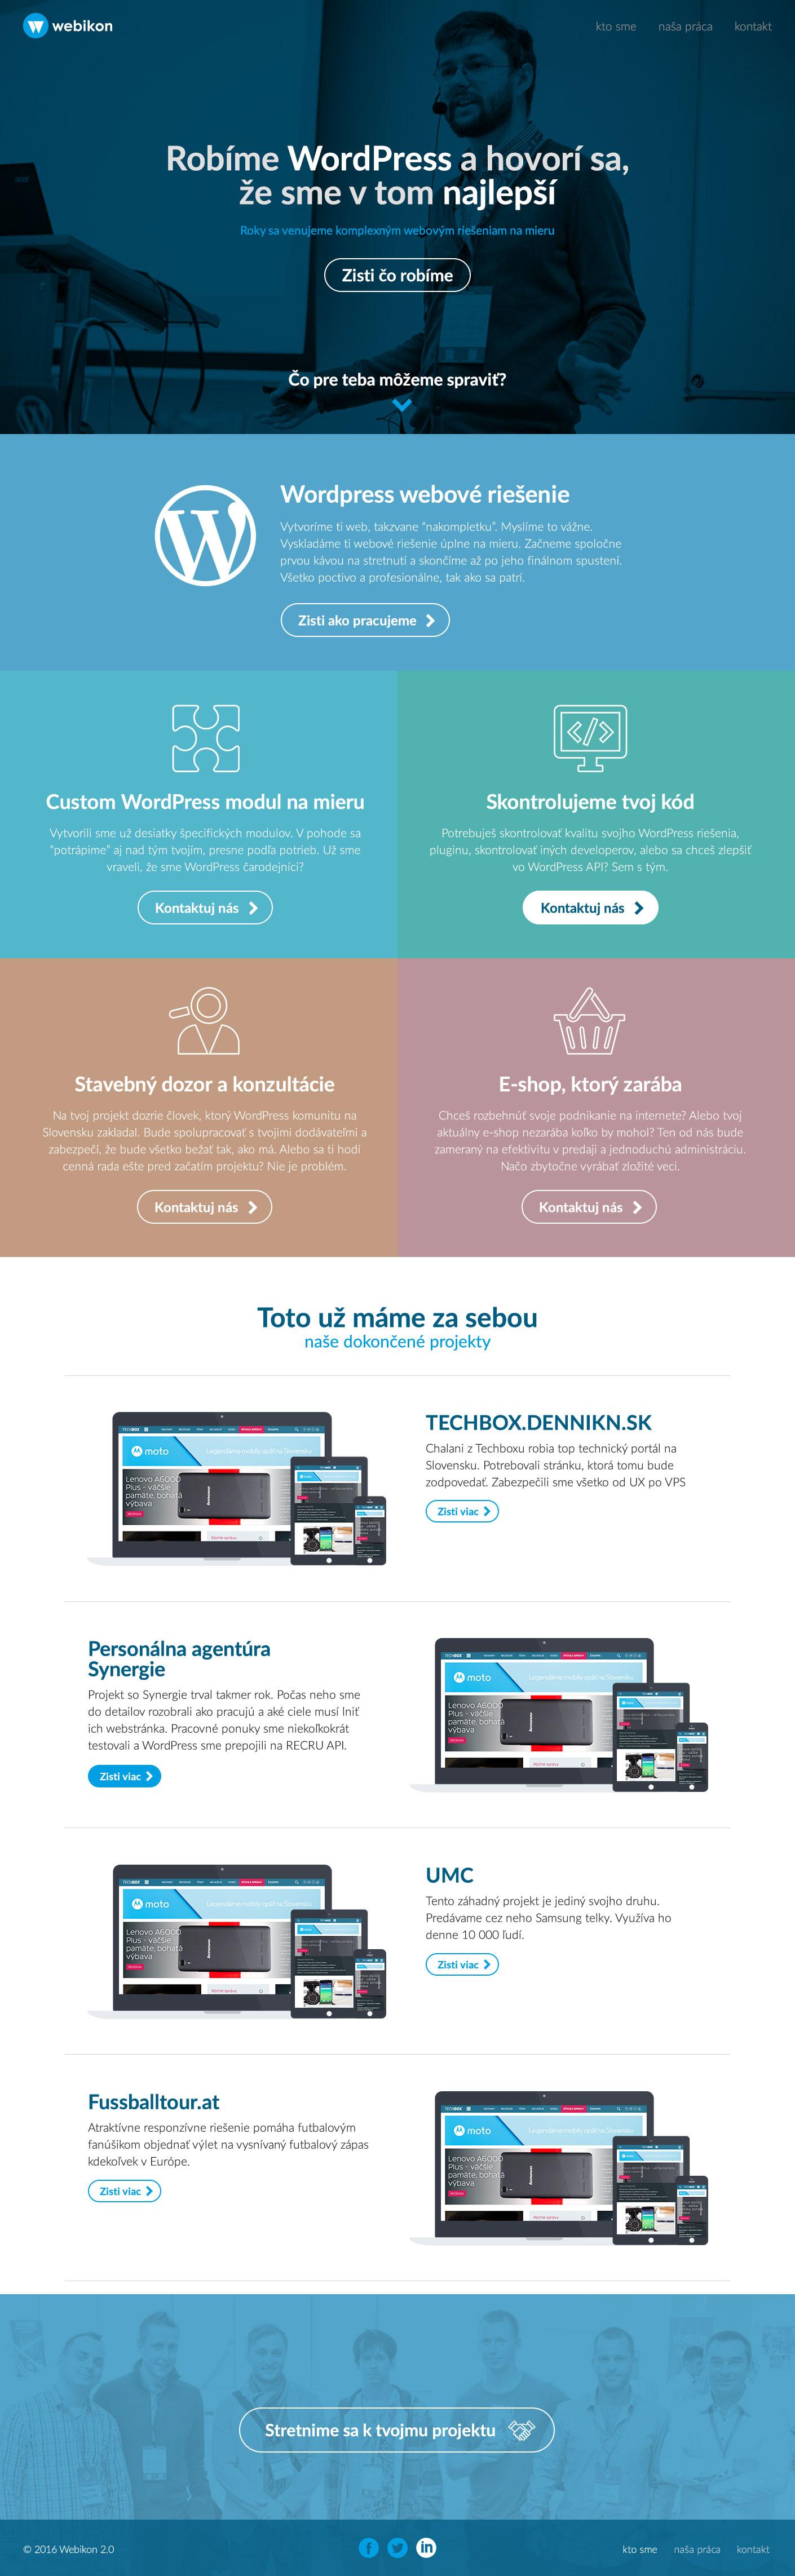 Webikon.sk - homepage